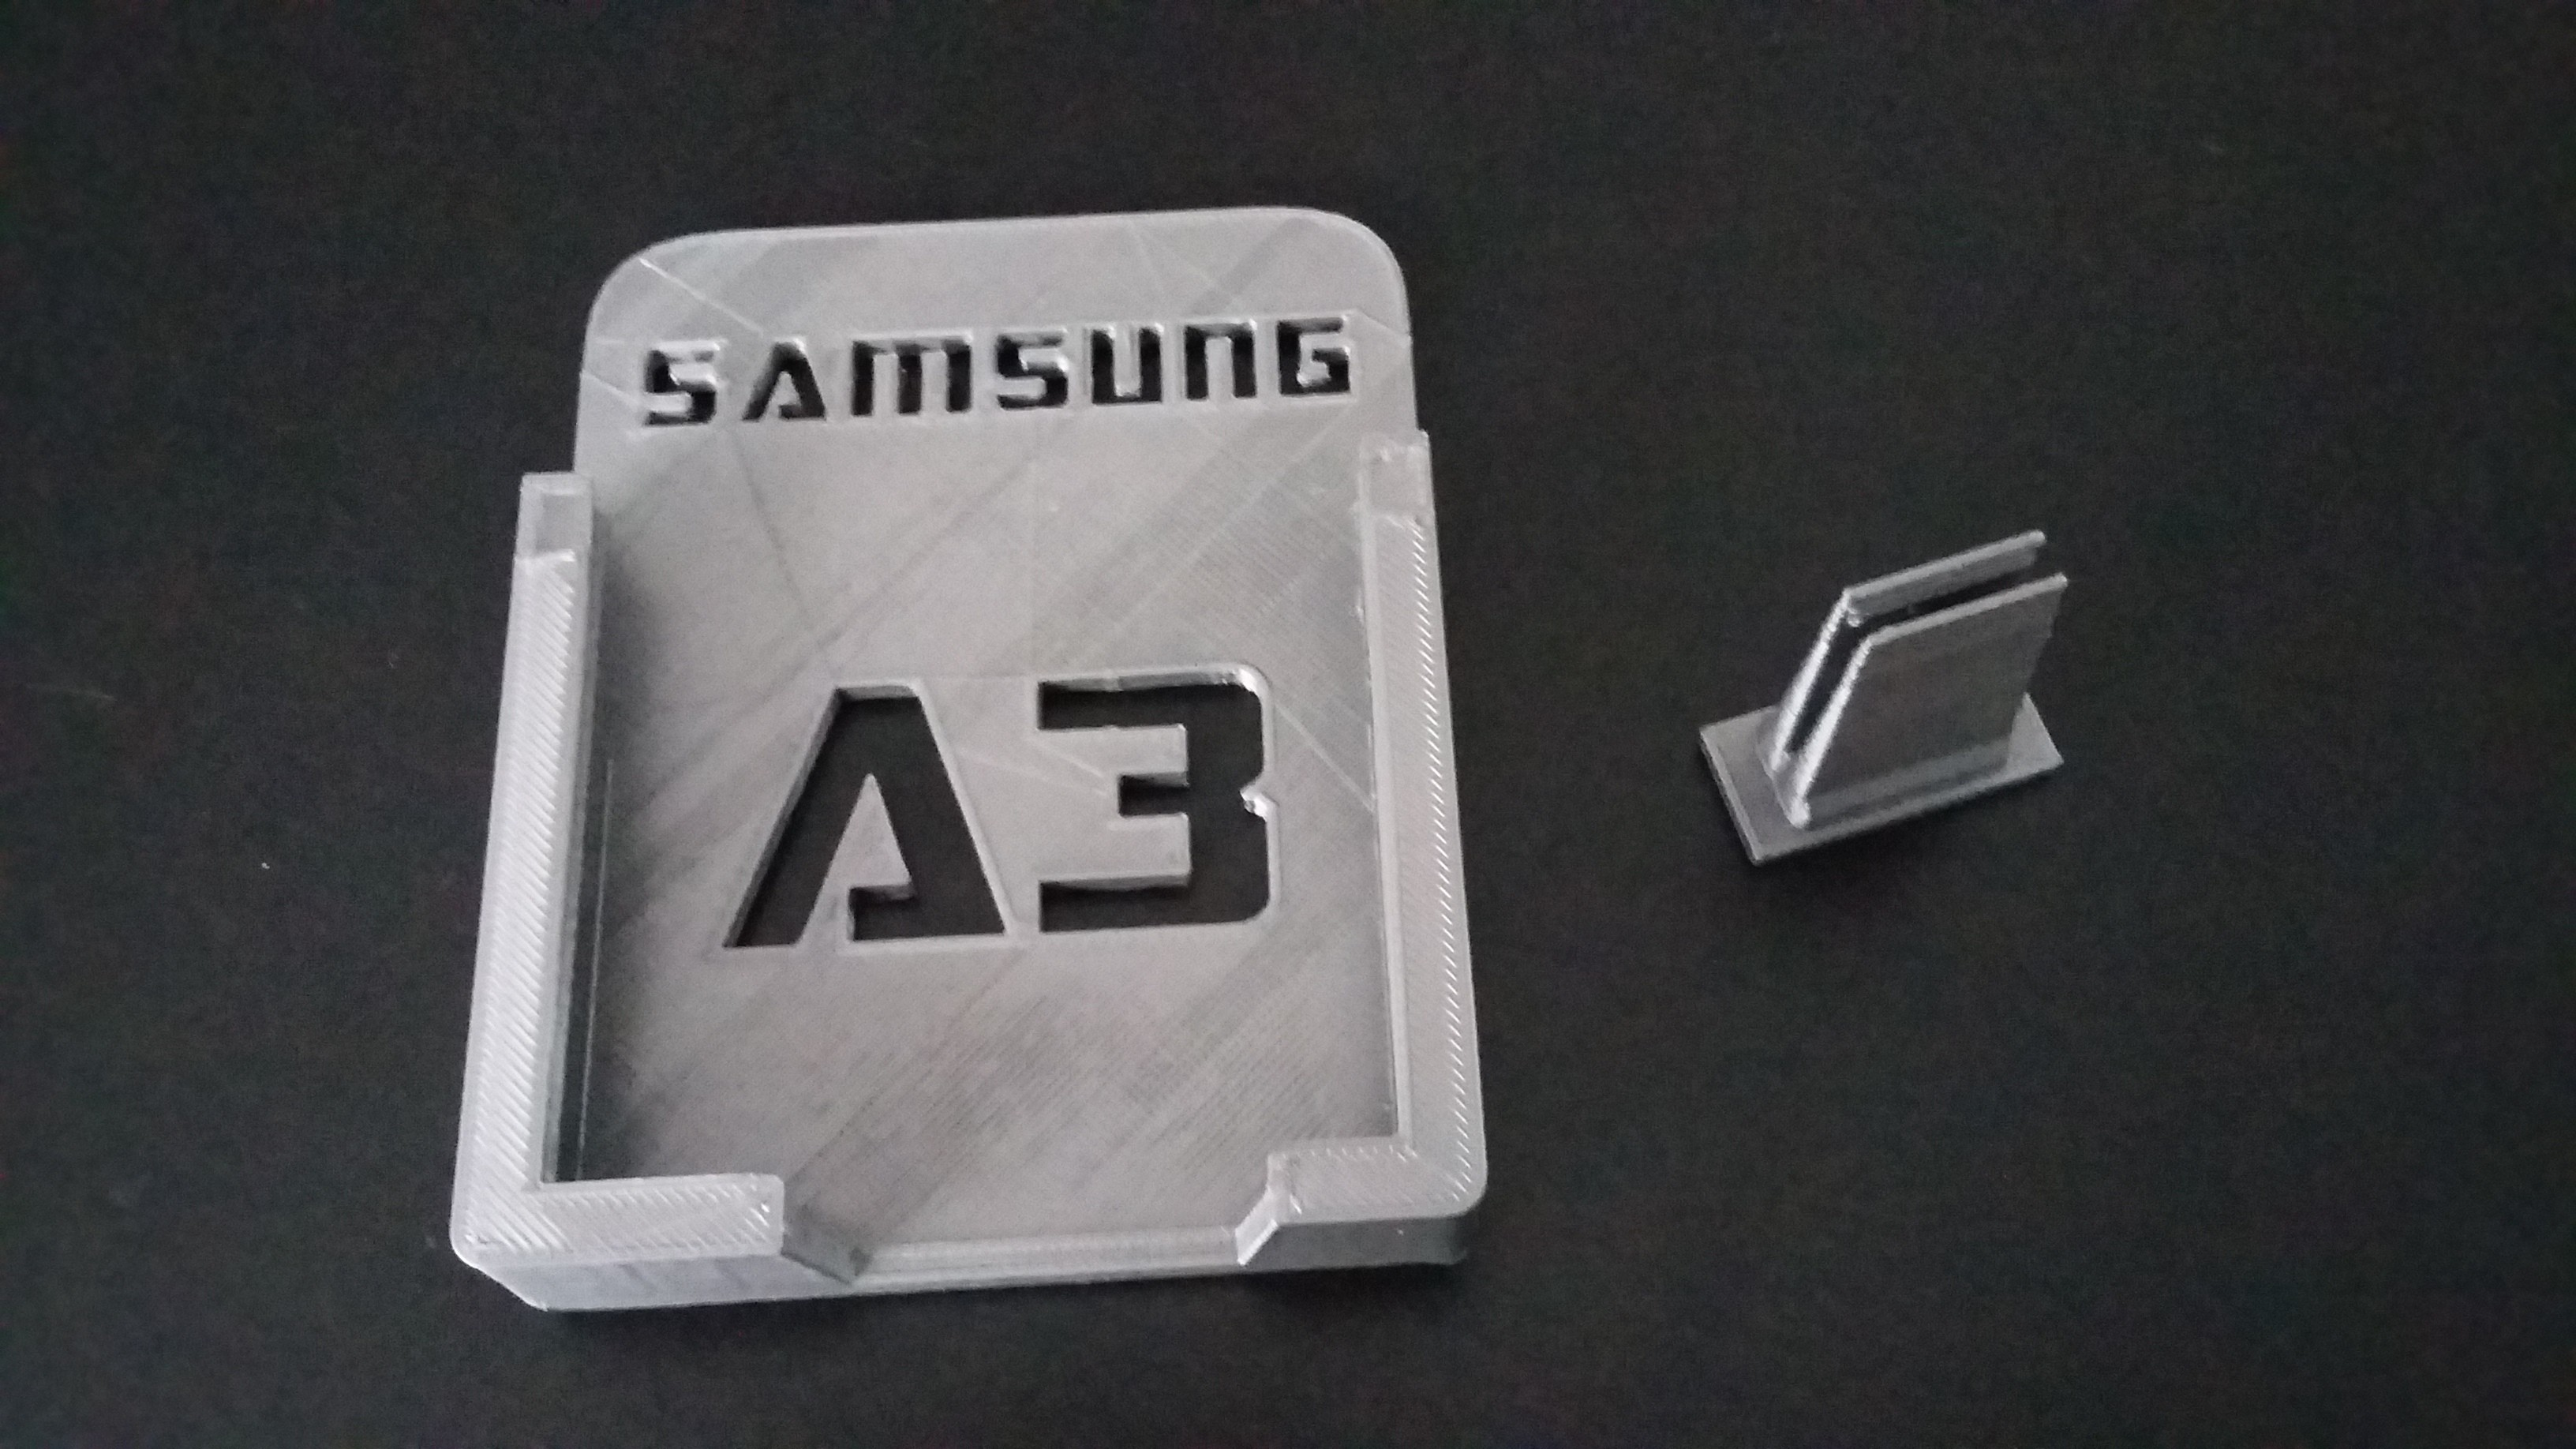 20170115_124401.jpg Download free STL file Samsung A3 Car Holder • 3D print template, Simdid